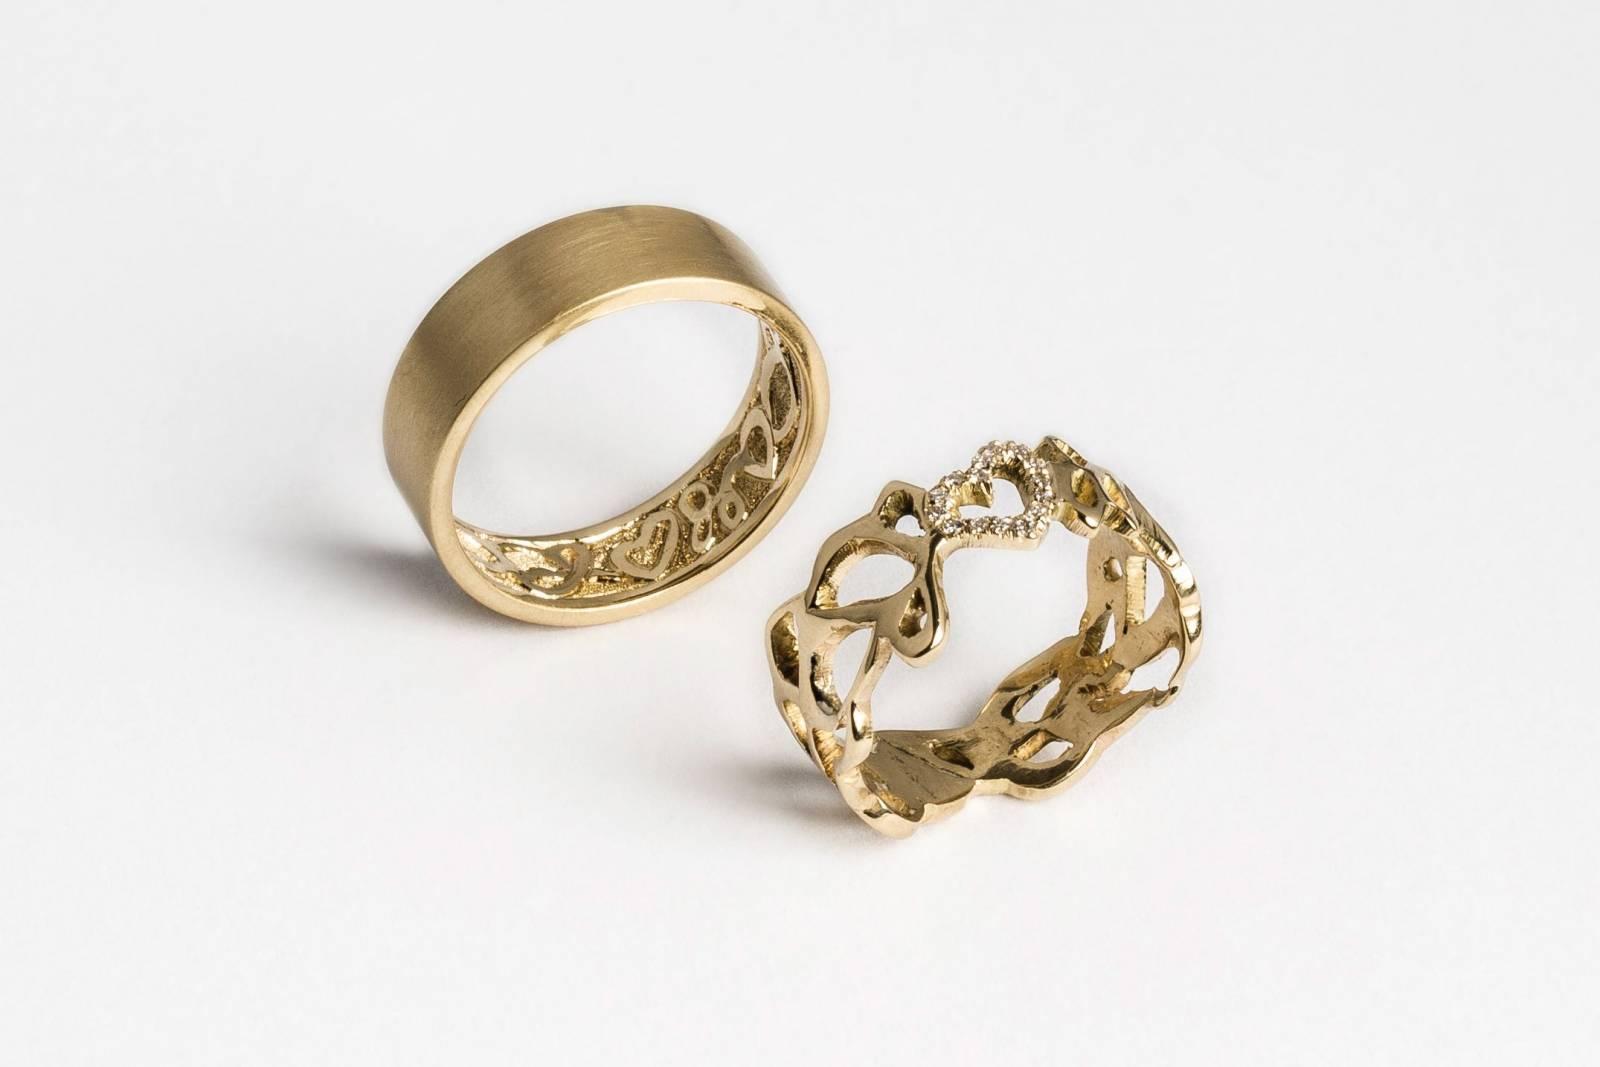 Nathalie Swinnen - Juwelen - Bruidsjuwelen - Verlovingsring - Trouwring - House of Weddings - 28